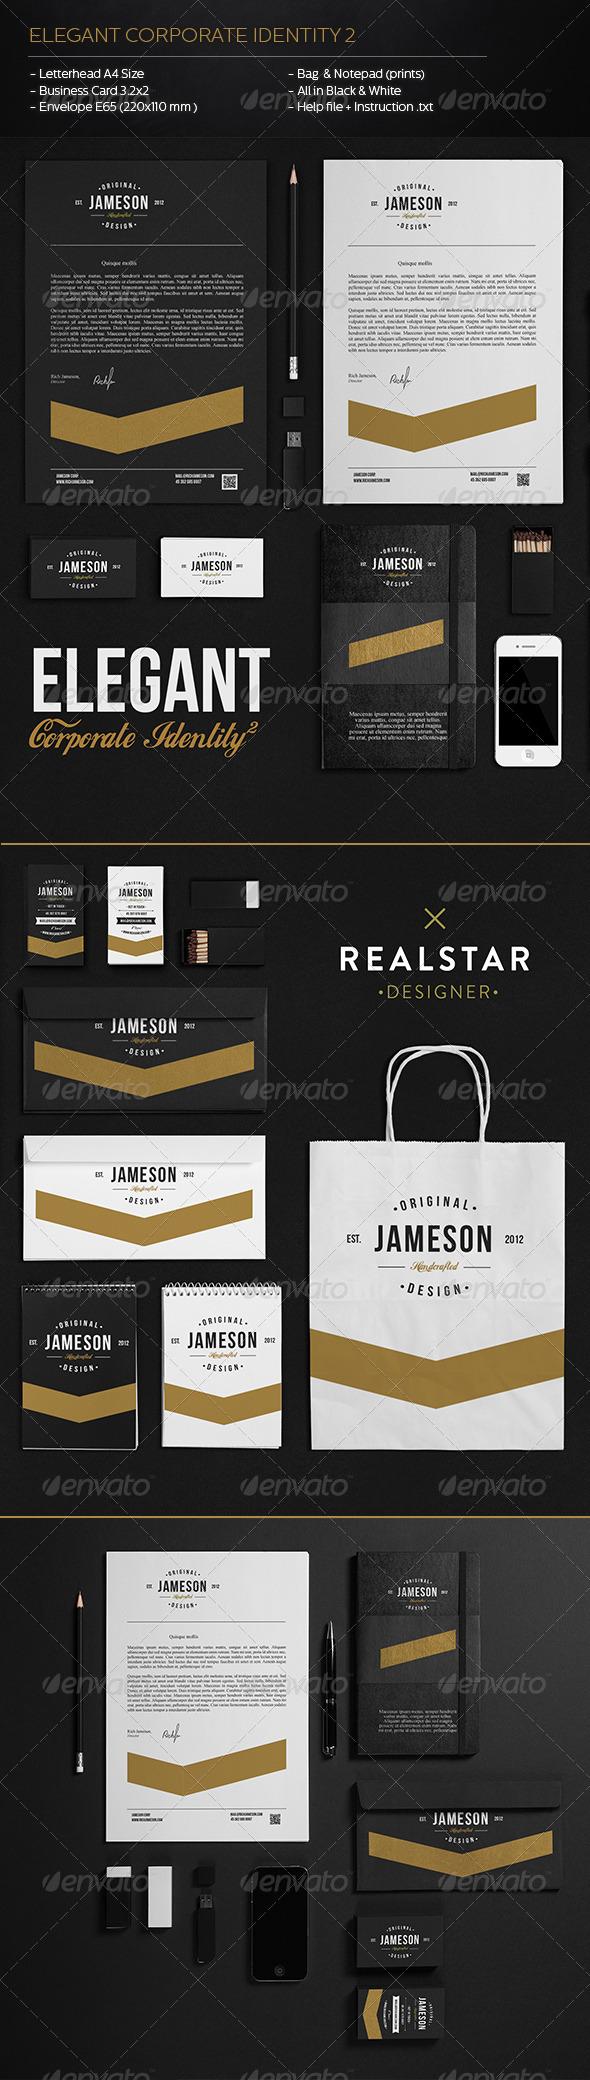 GraphicRiver Elegant Corporate Identity 2 5994016